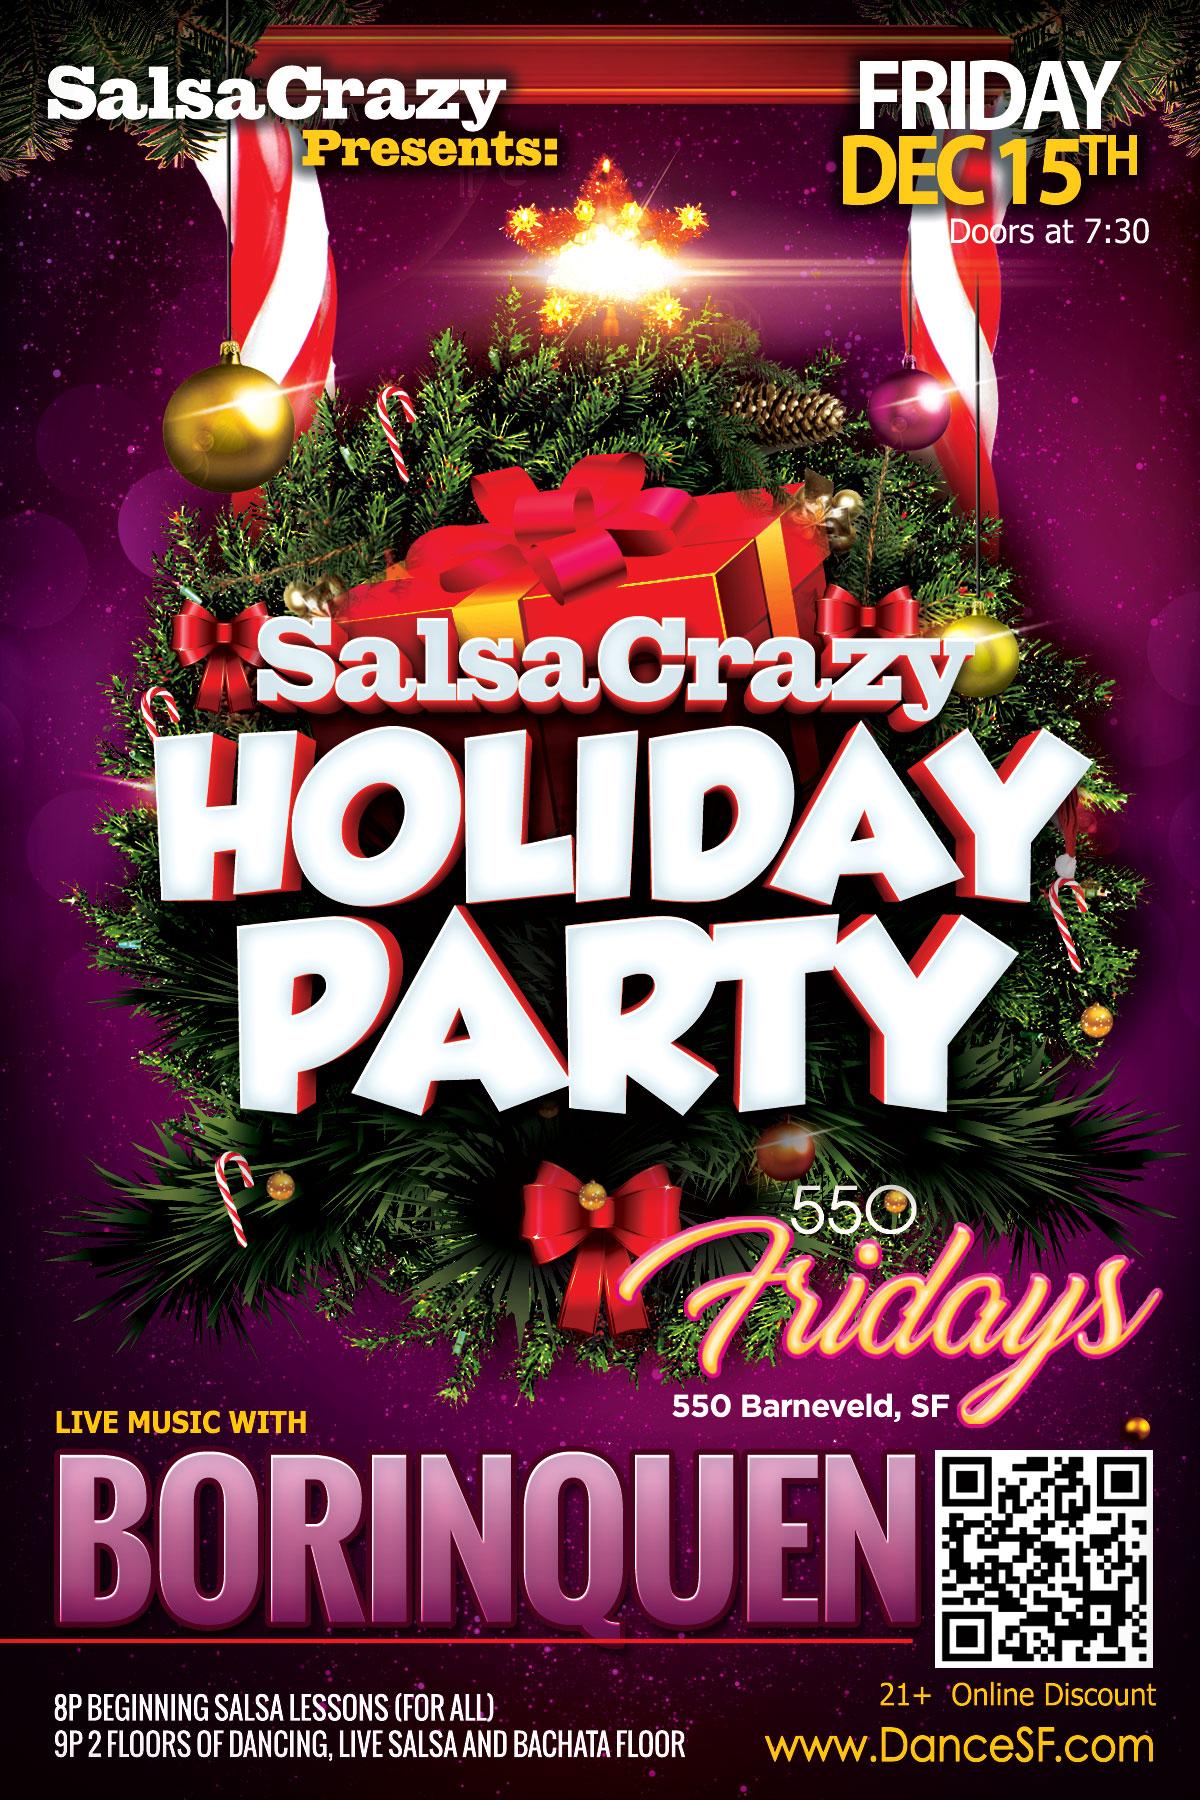 Dance Fridays, 550 Barneveld, SF, 21+ - www.DanceFridays.com